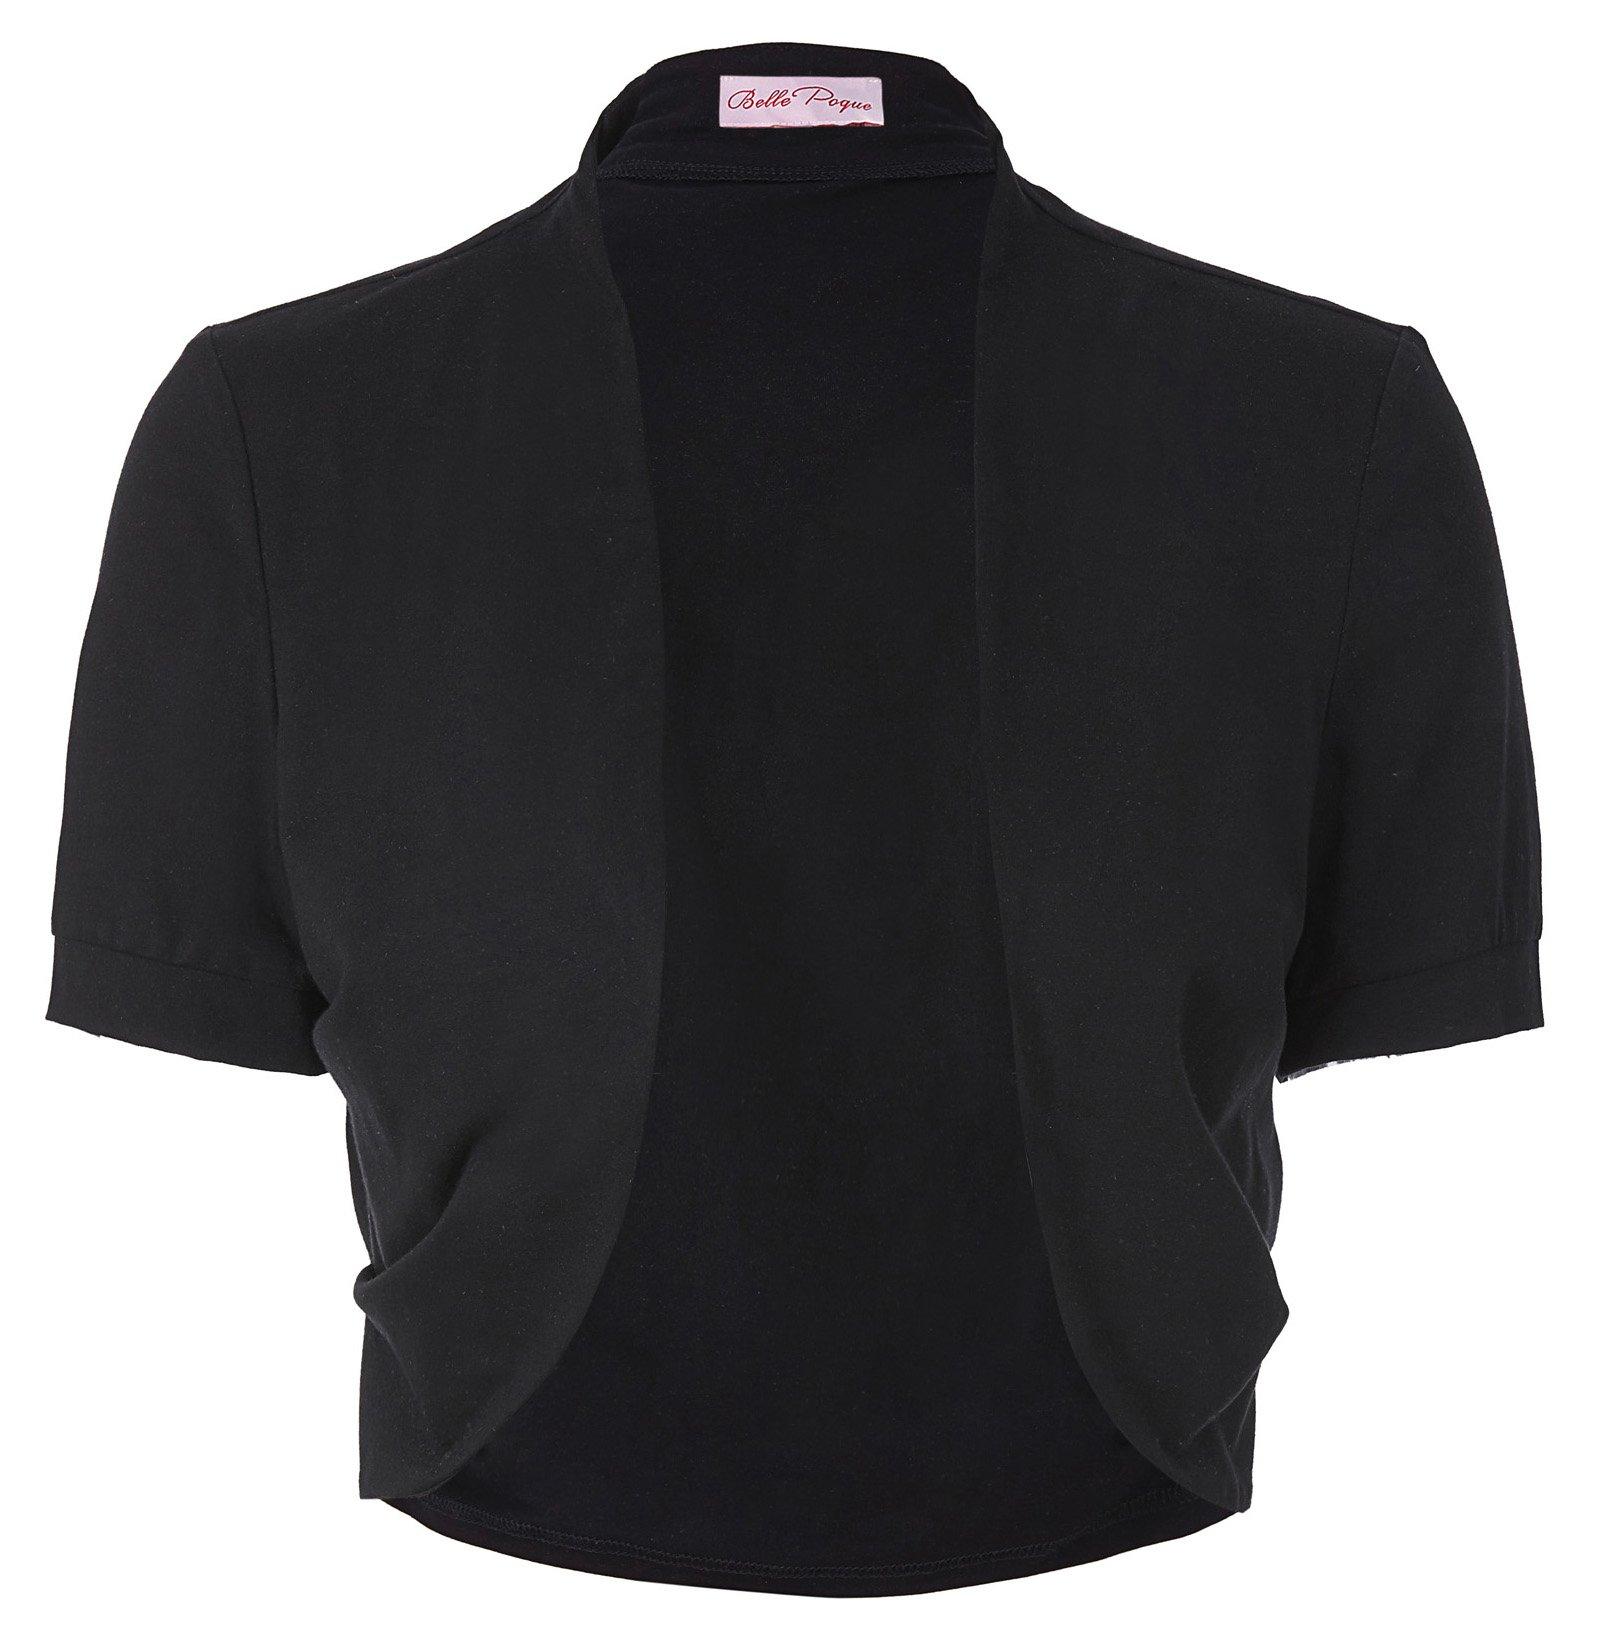 Basic Cotton Pleated Sides Bolero Shrug for Women (L,Black) by Belle Poque